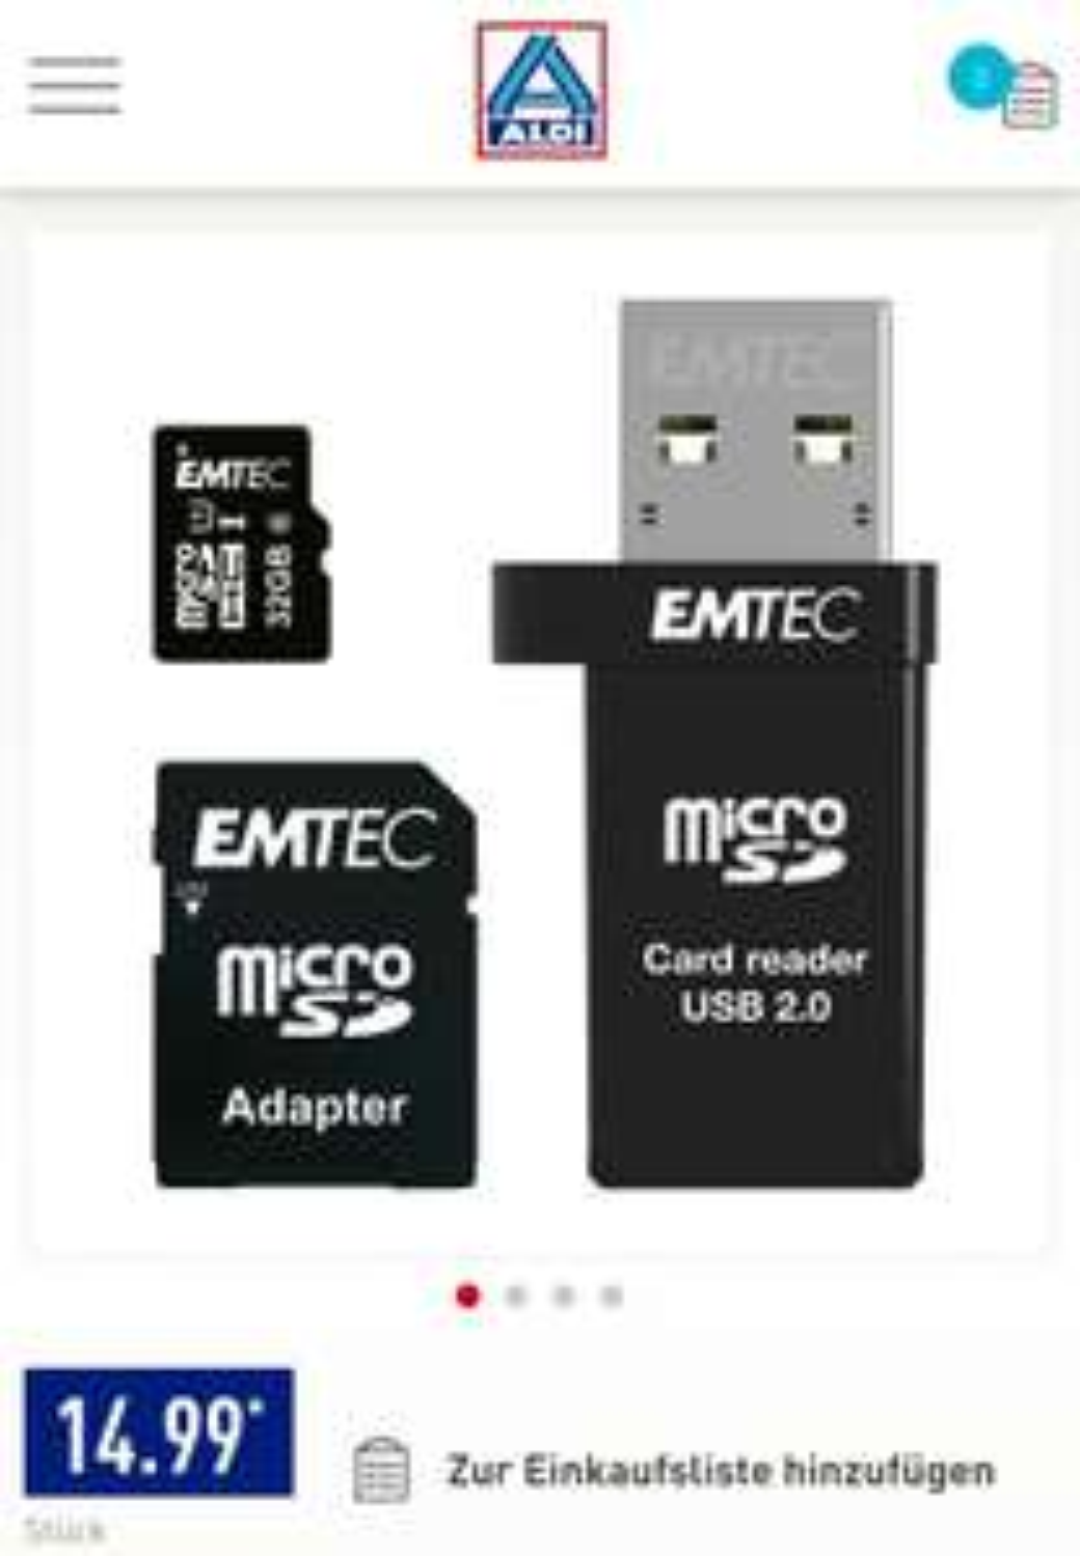 [Aldi Nord OFFLINE] Emtec microSDHC 32GB + USB-Reader + SD-Adapter [ab 18.12.]